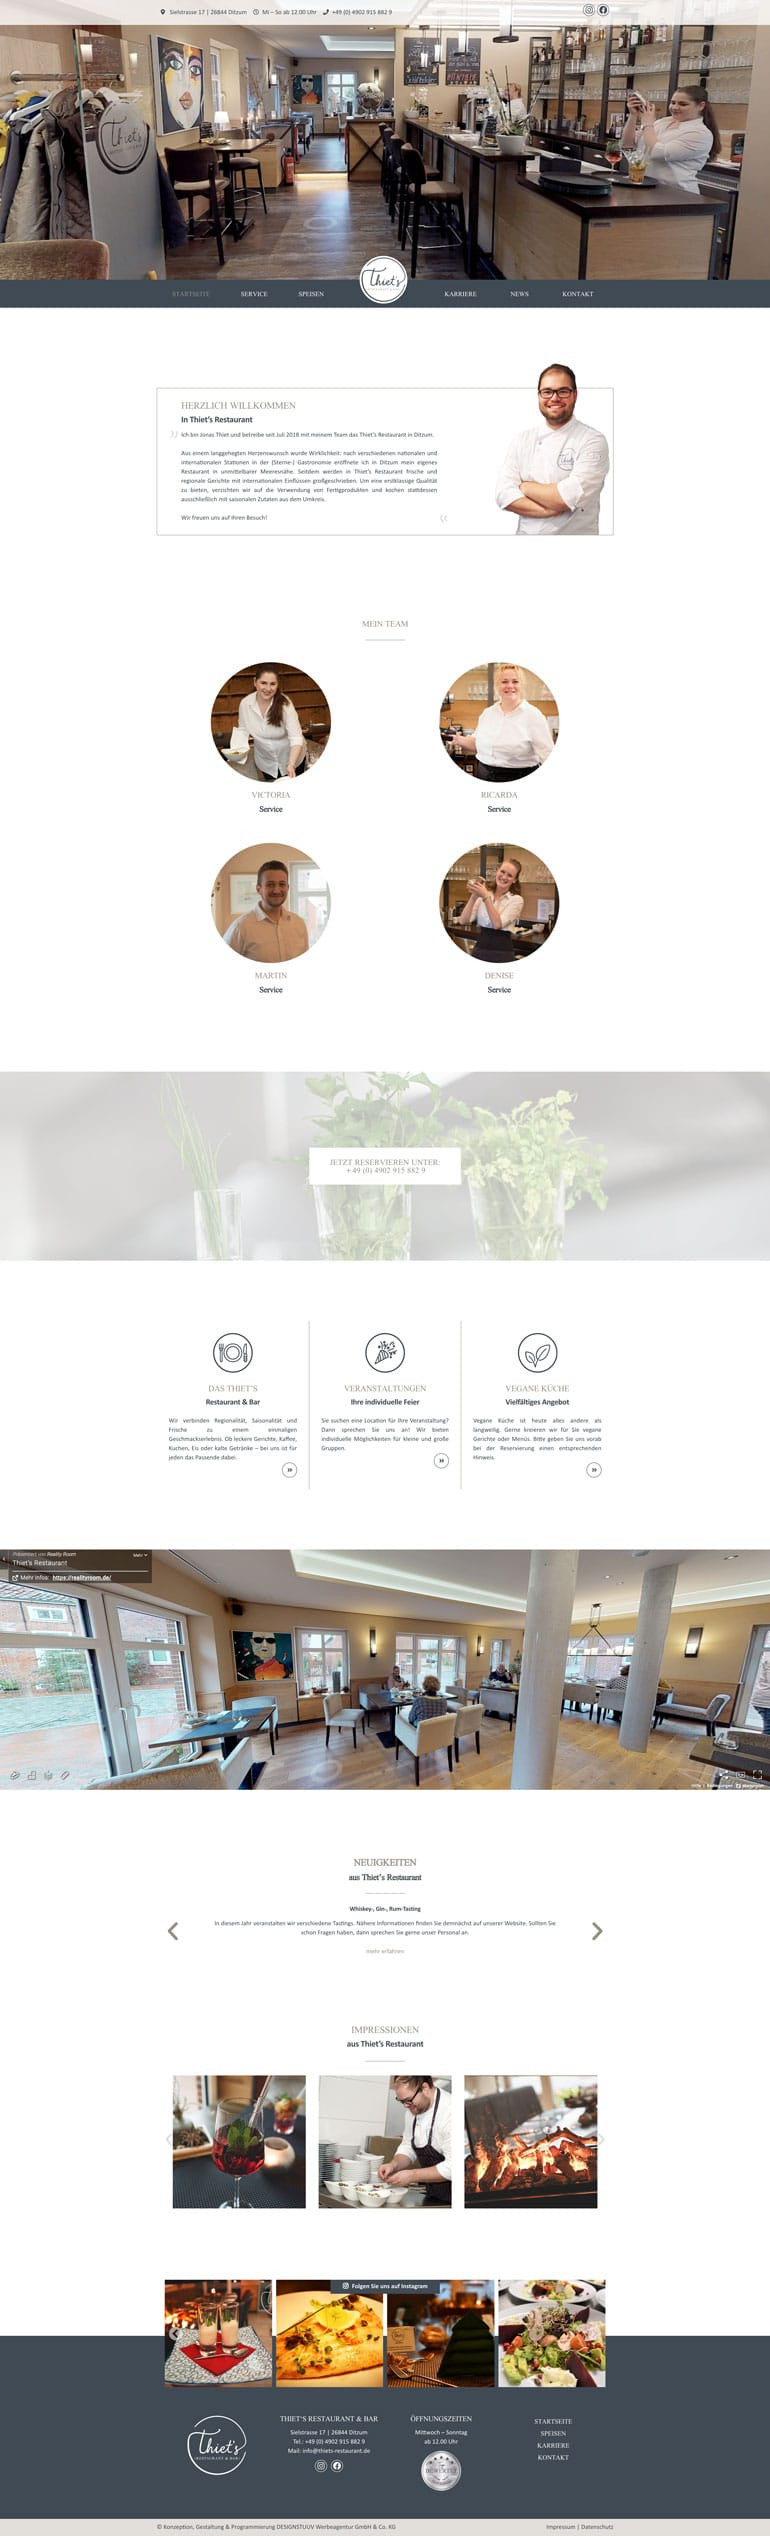 Designstuuv Referenzen Thiets Website desktop